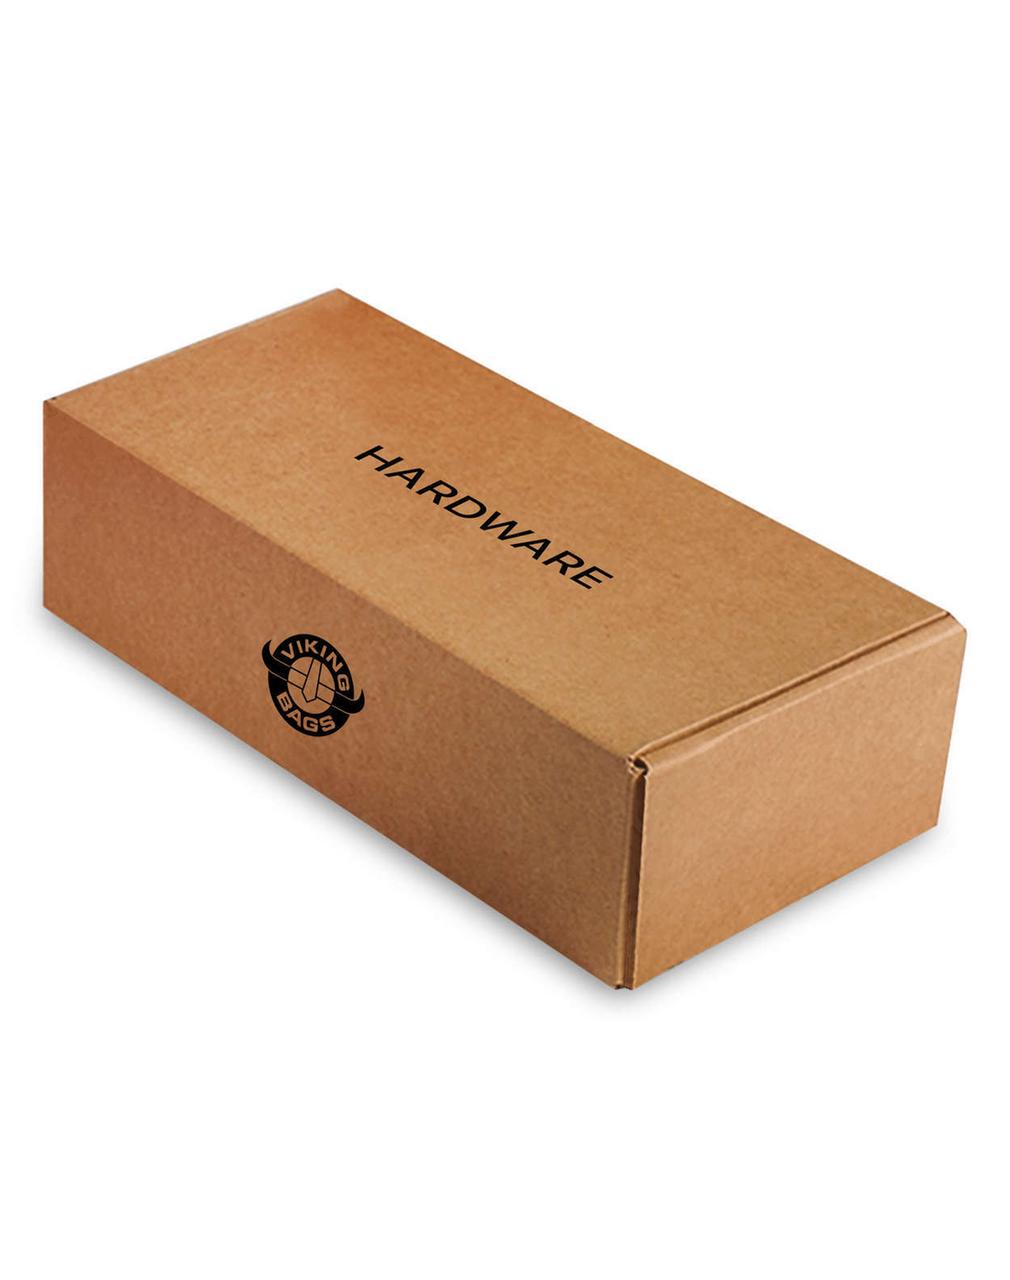 Honda VTX 1800 S Lamellar Extra Large Shock Cutout Saddlebag box